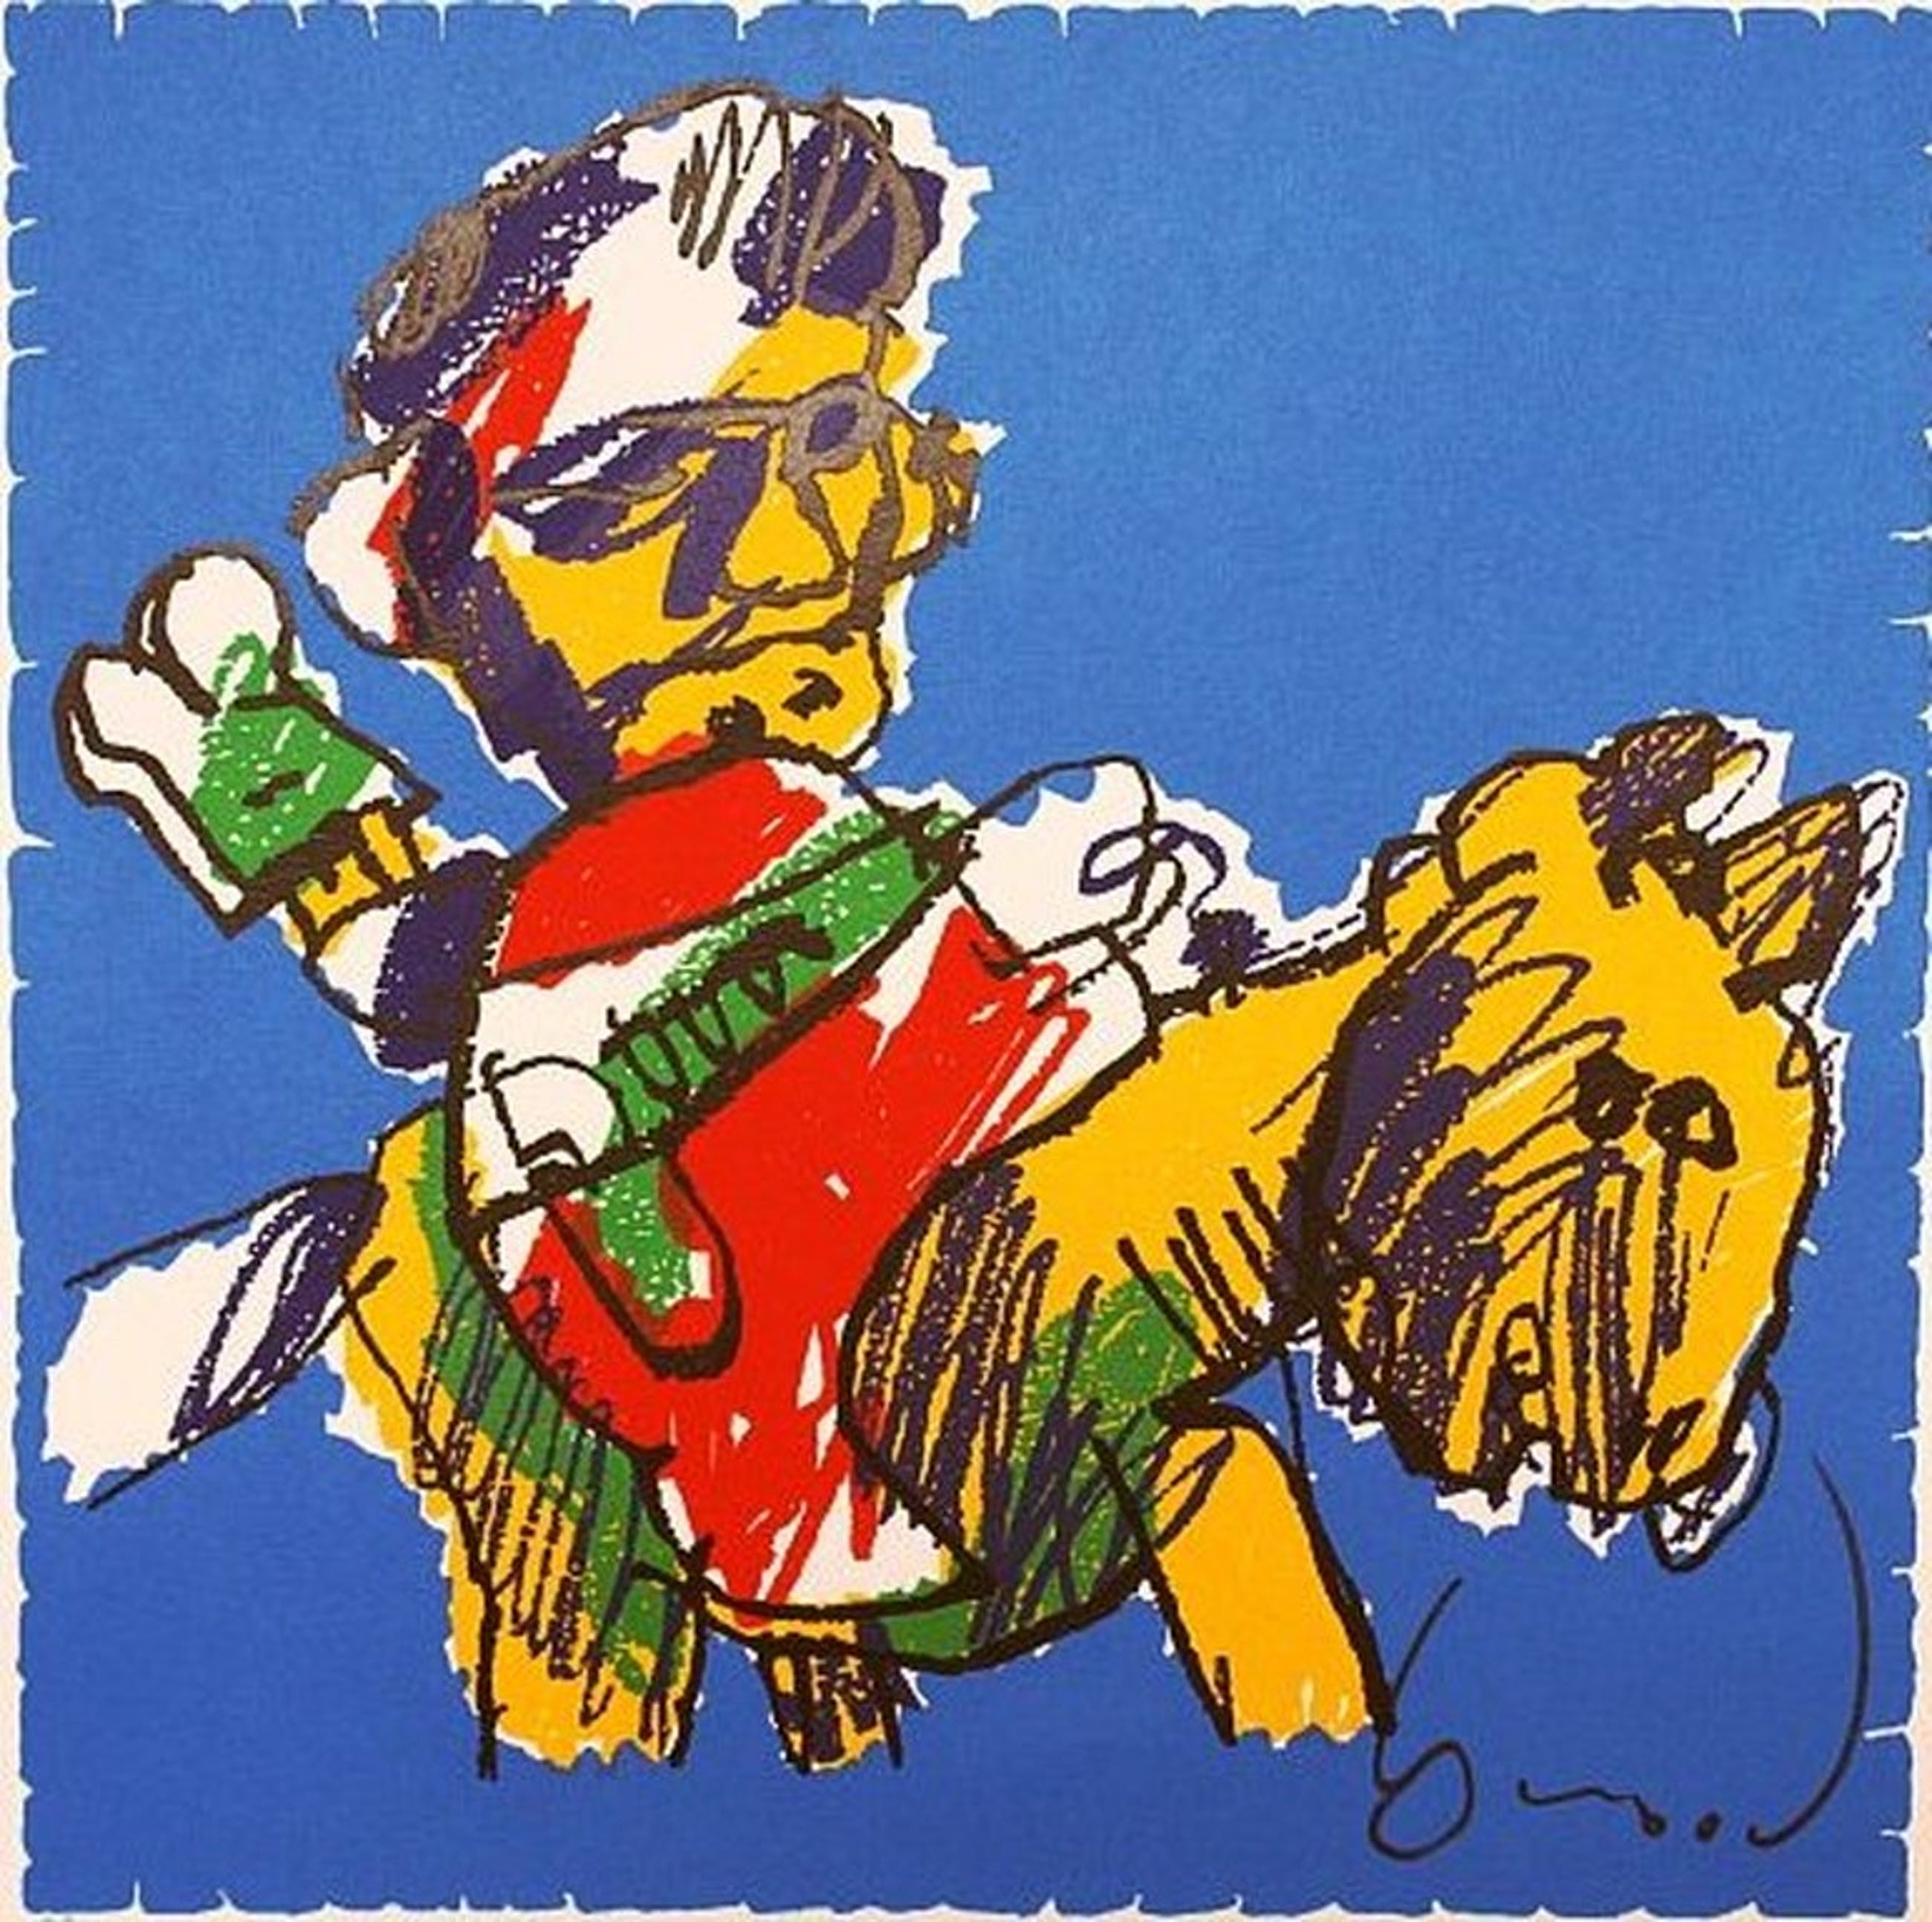 Herman Brood, Man op paard (proefdruk) 70 x 70 kopen? Bied vanaf 1!